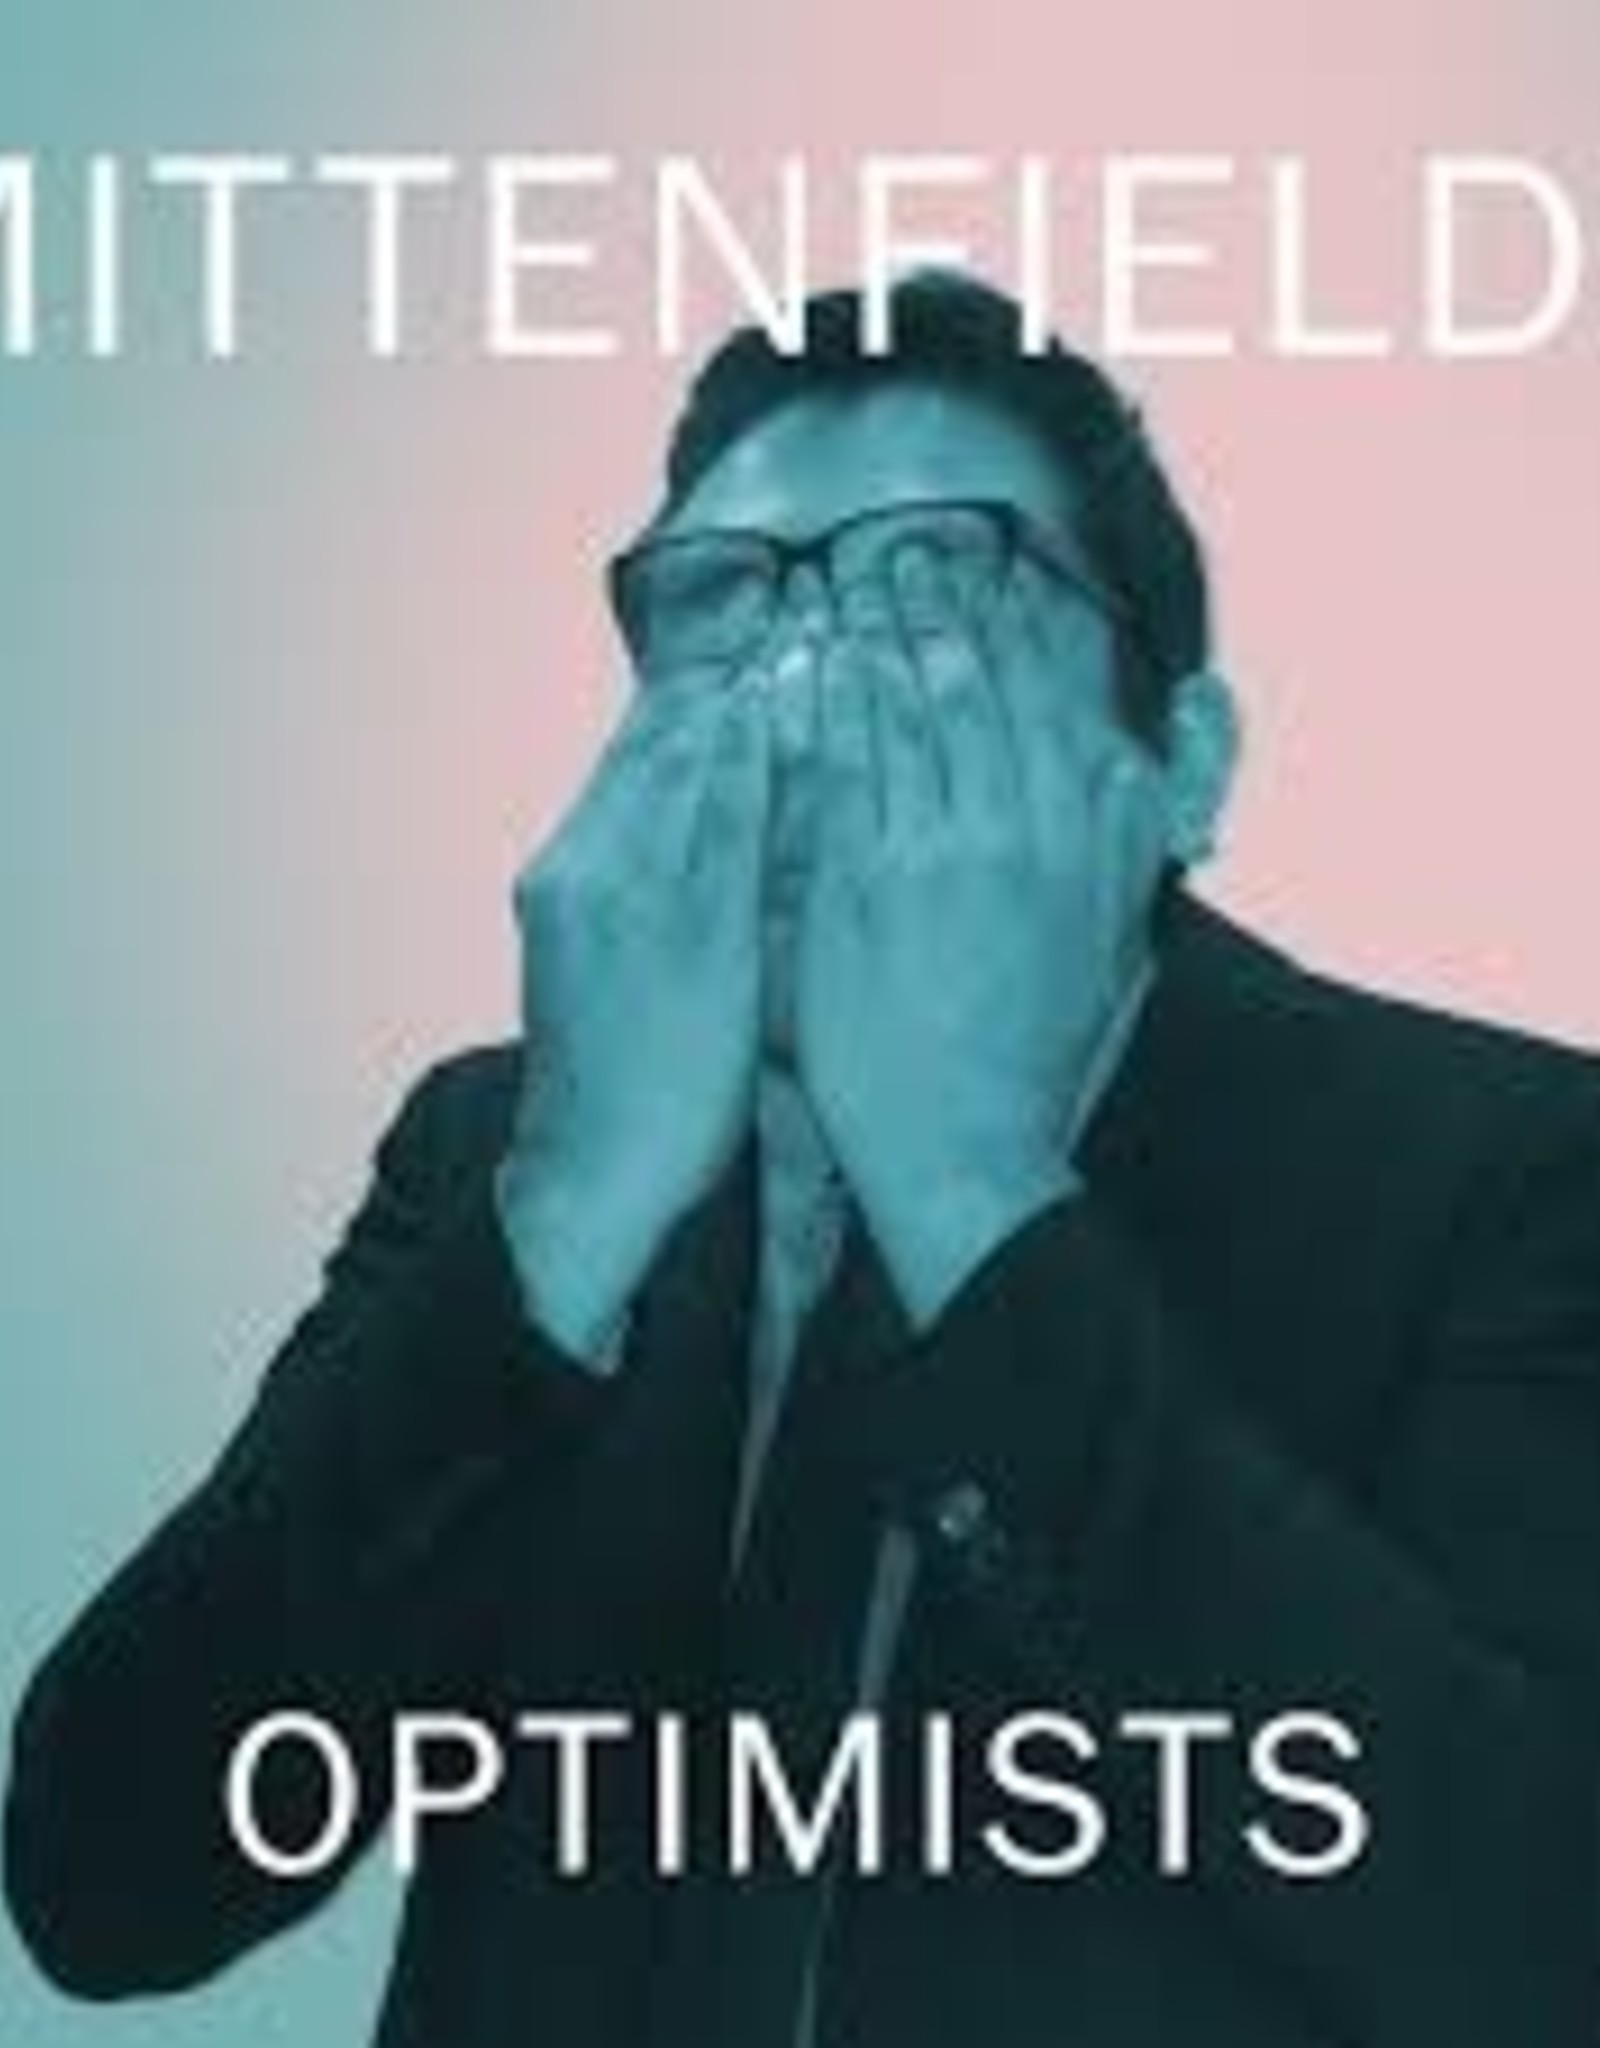 Mittenfields - Optimists